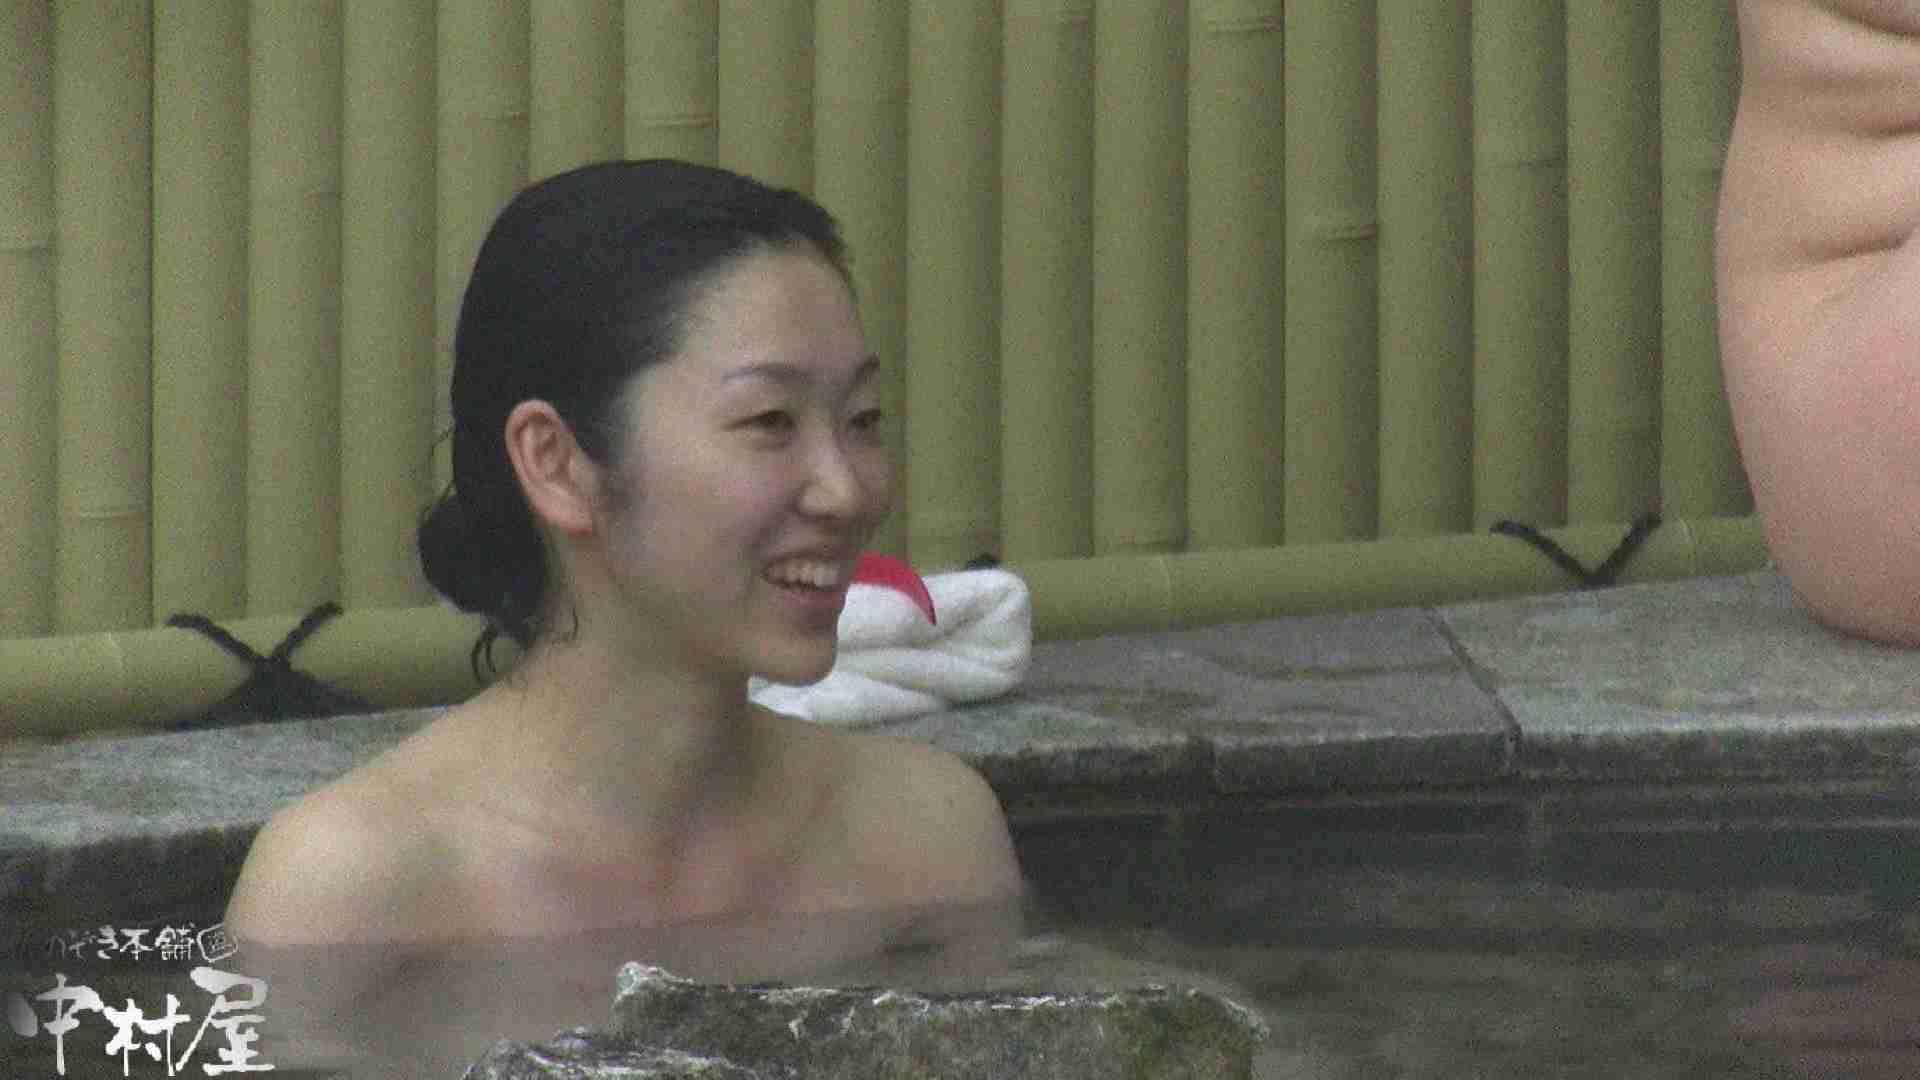 Aquaな露天風呂Vol.917 OLセックス  102画像 54